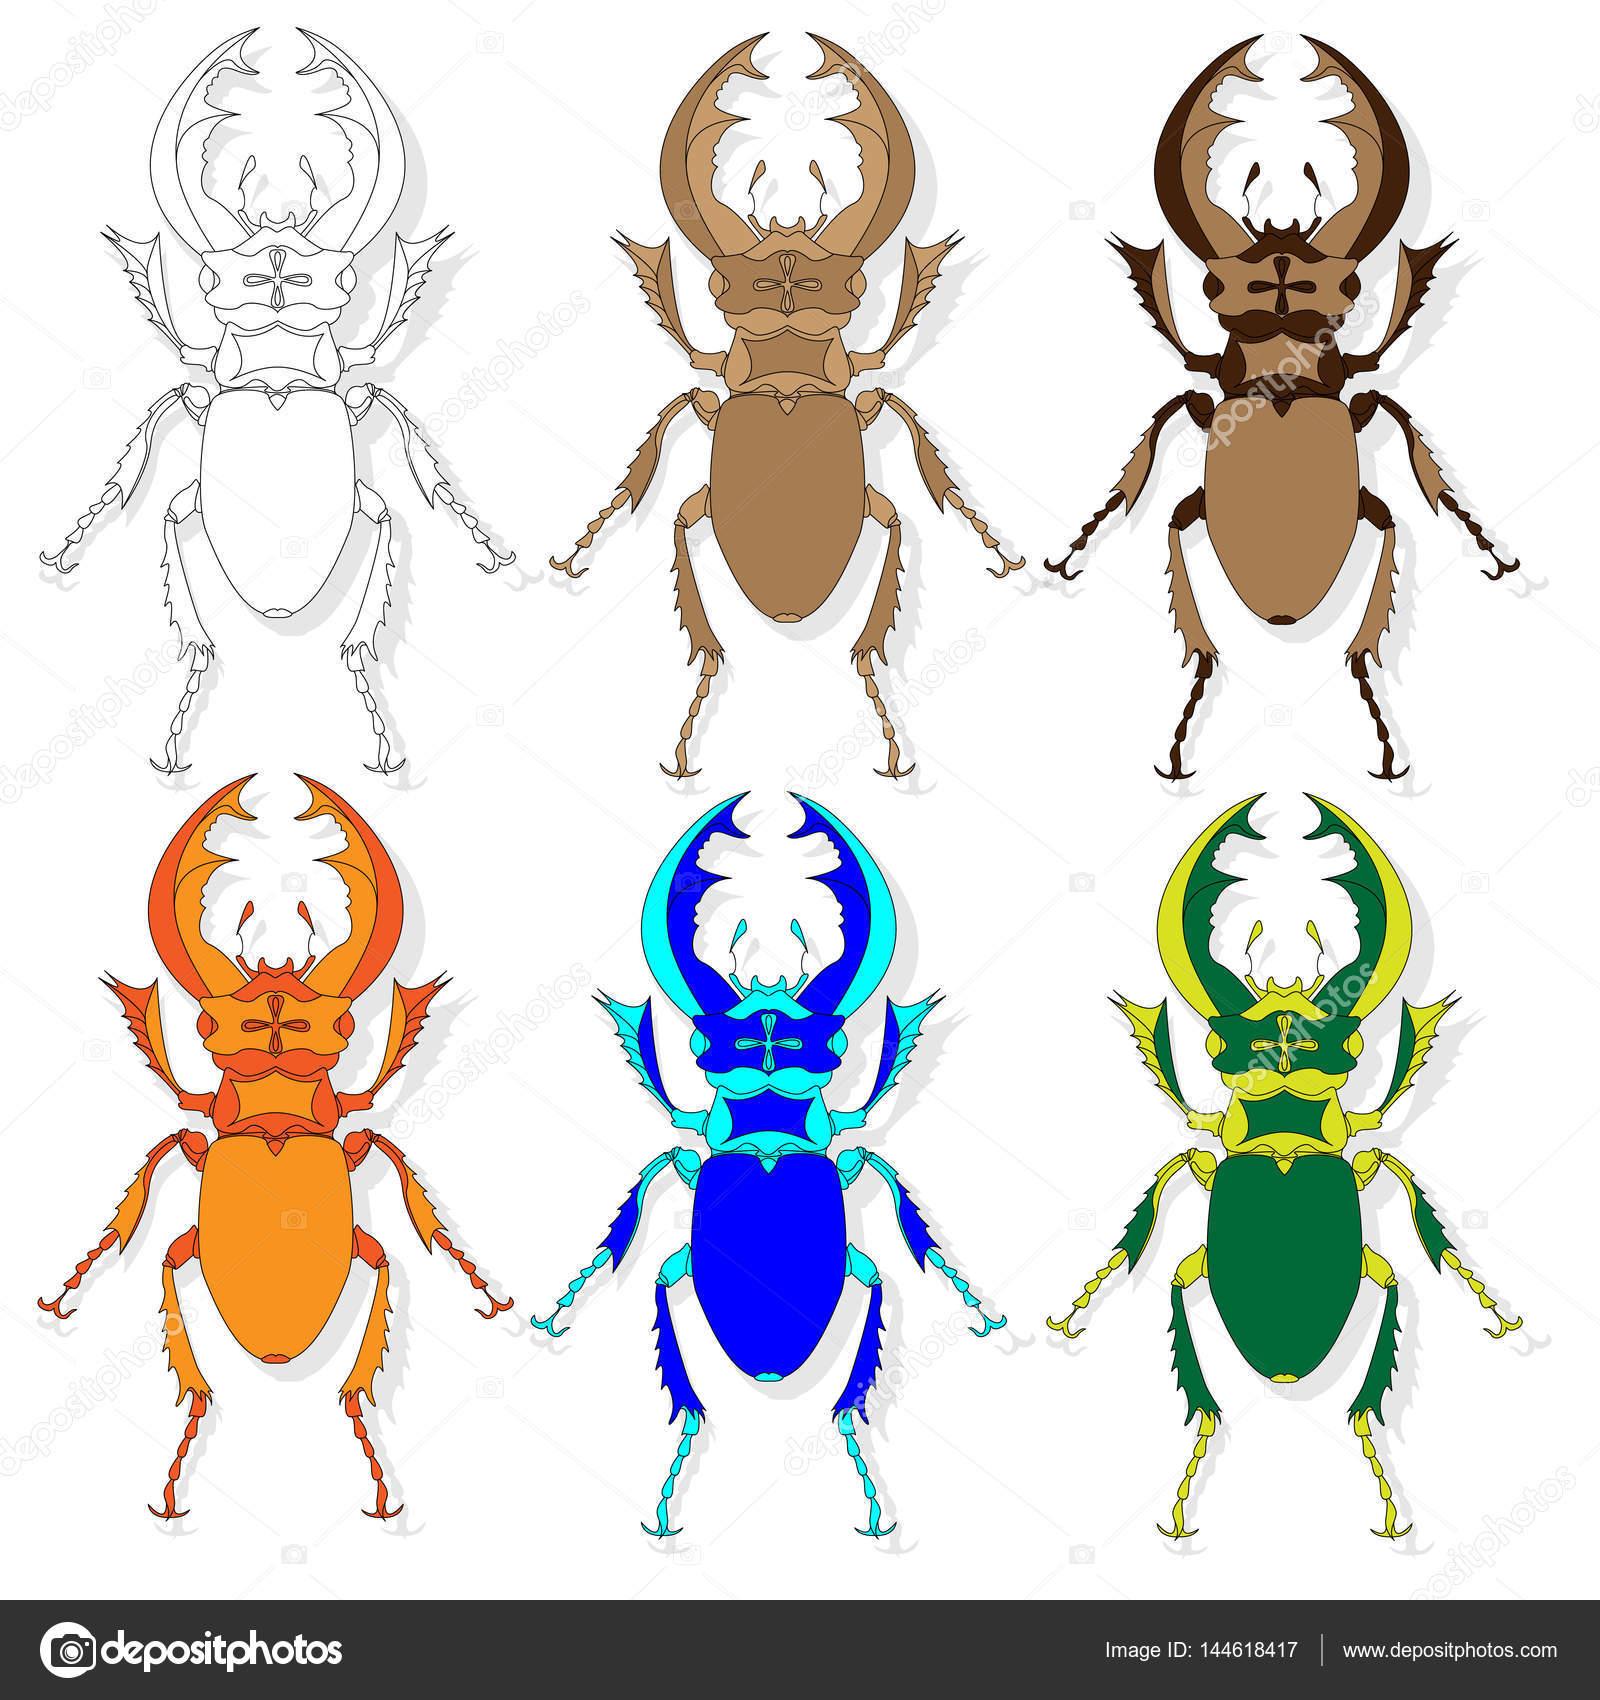 Käfer. Hand gezeichnete Skizze — Stockvektor © alekseyk1975 #144618417